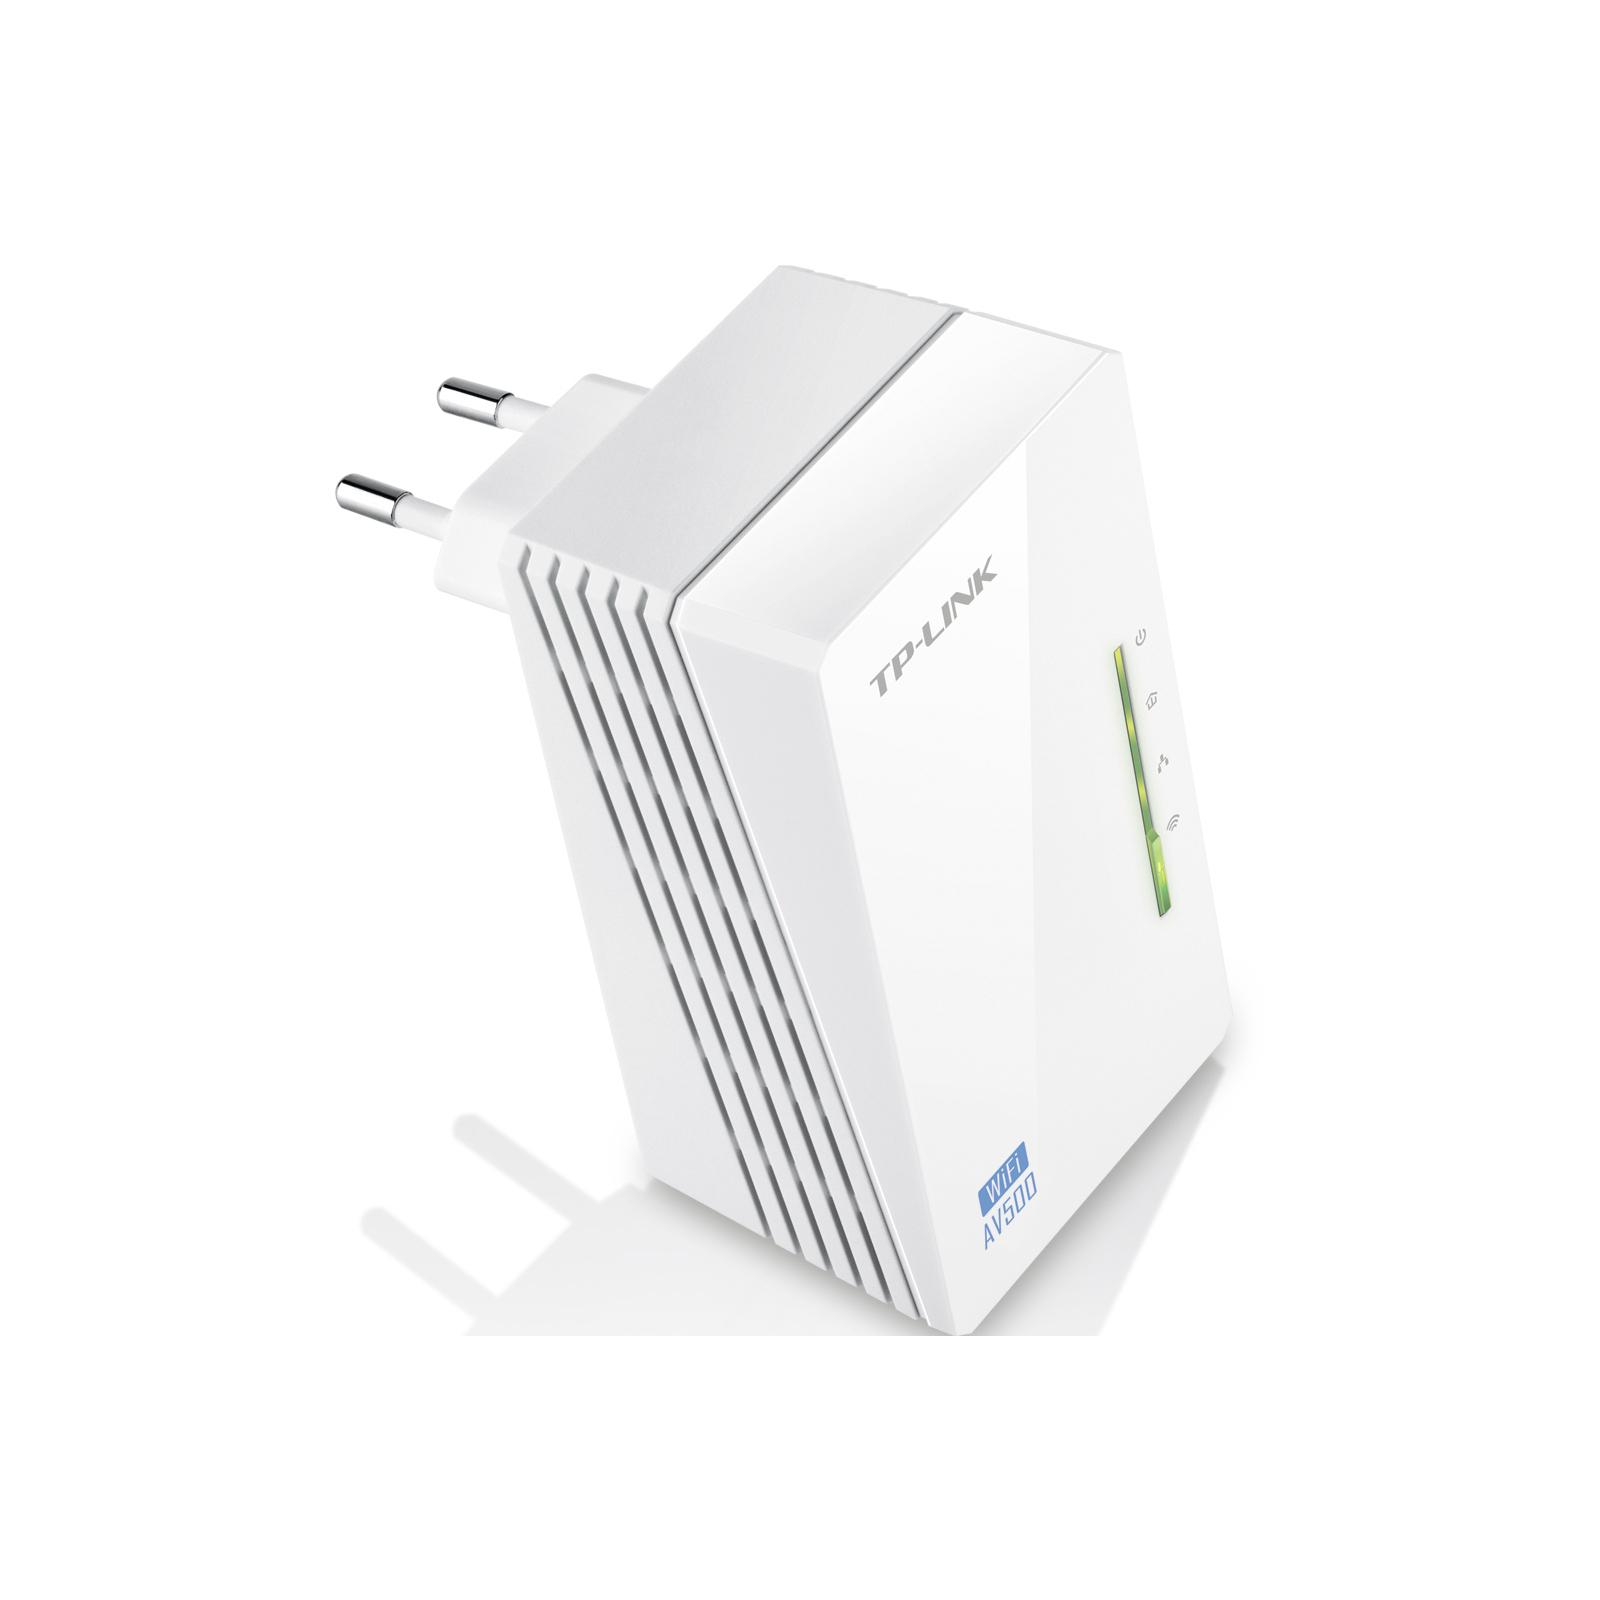 Адаптер Powerline TP-Link TL-WPA4220 изображение 3